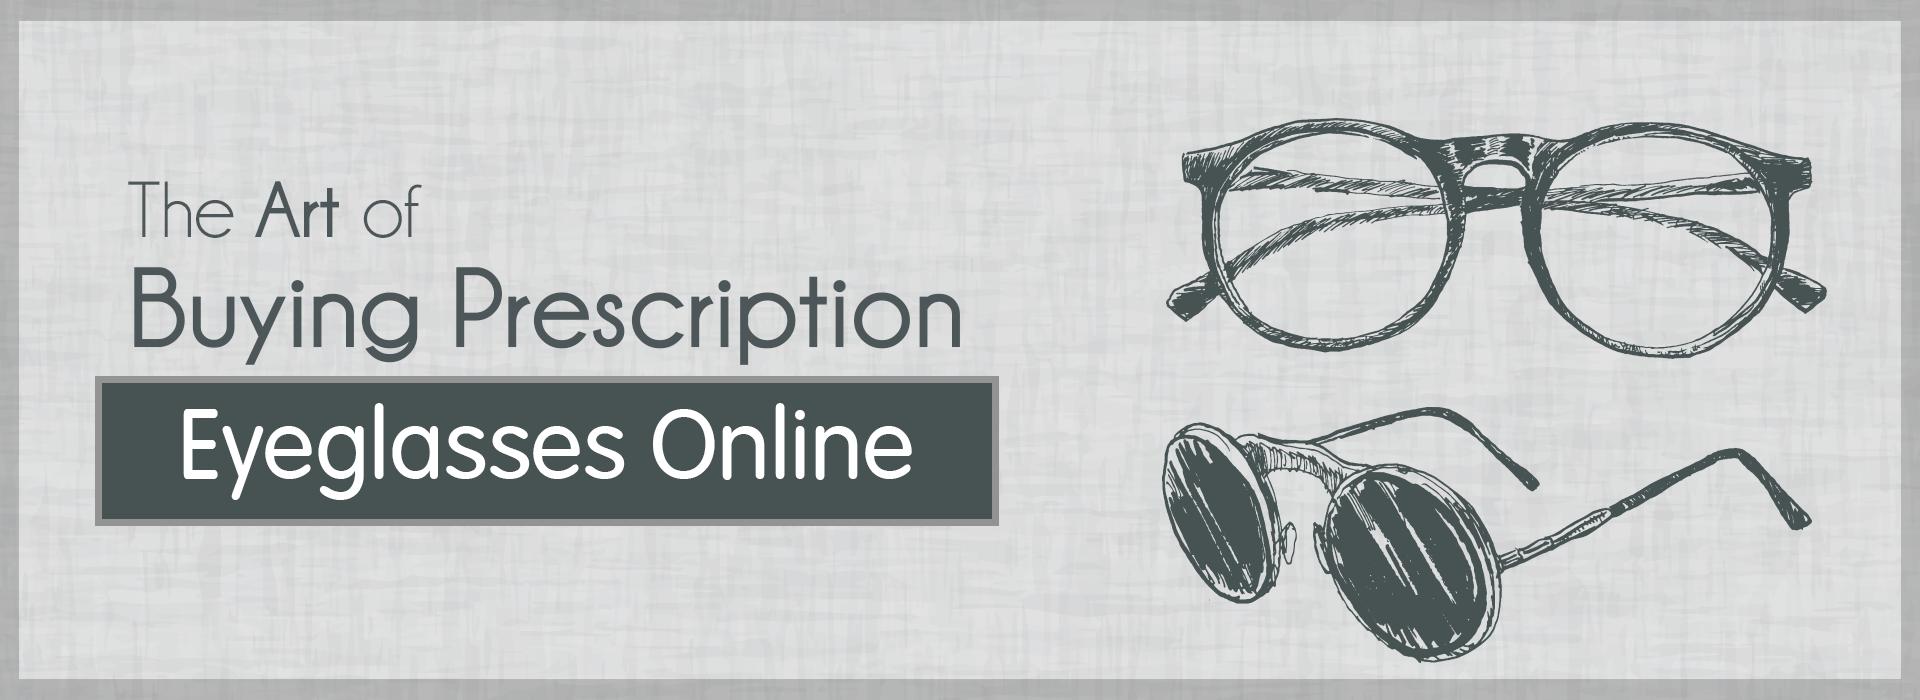 The Art of Buying Prescription Eyeglasses Online